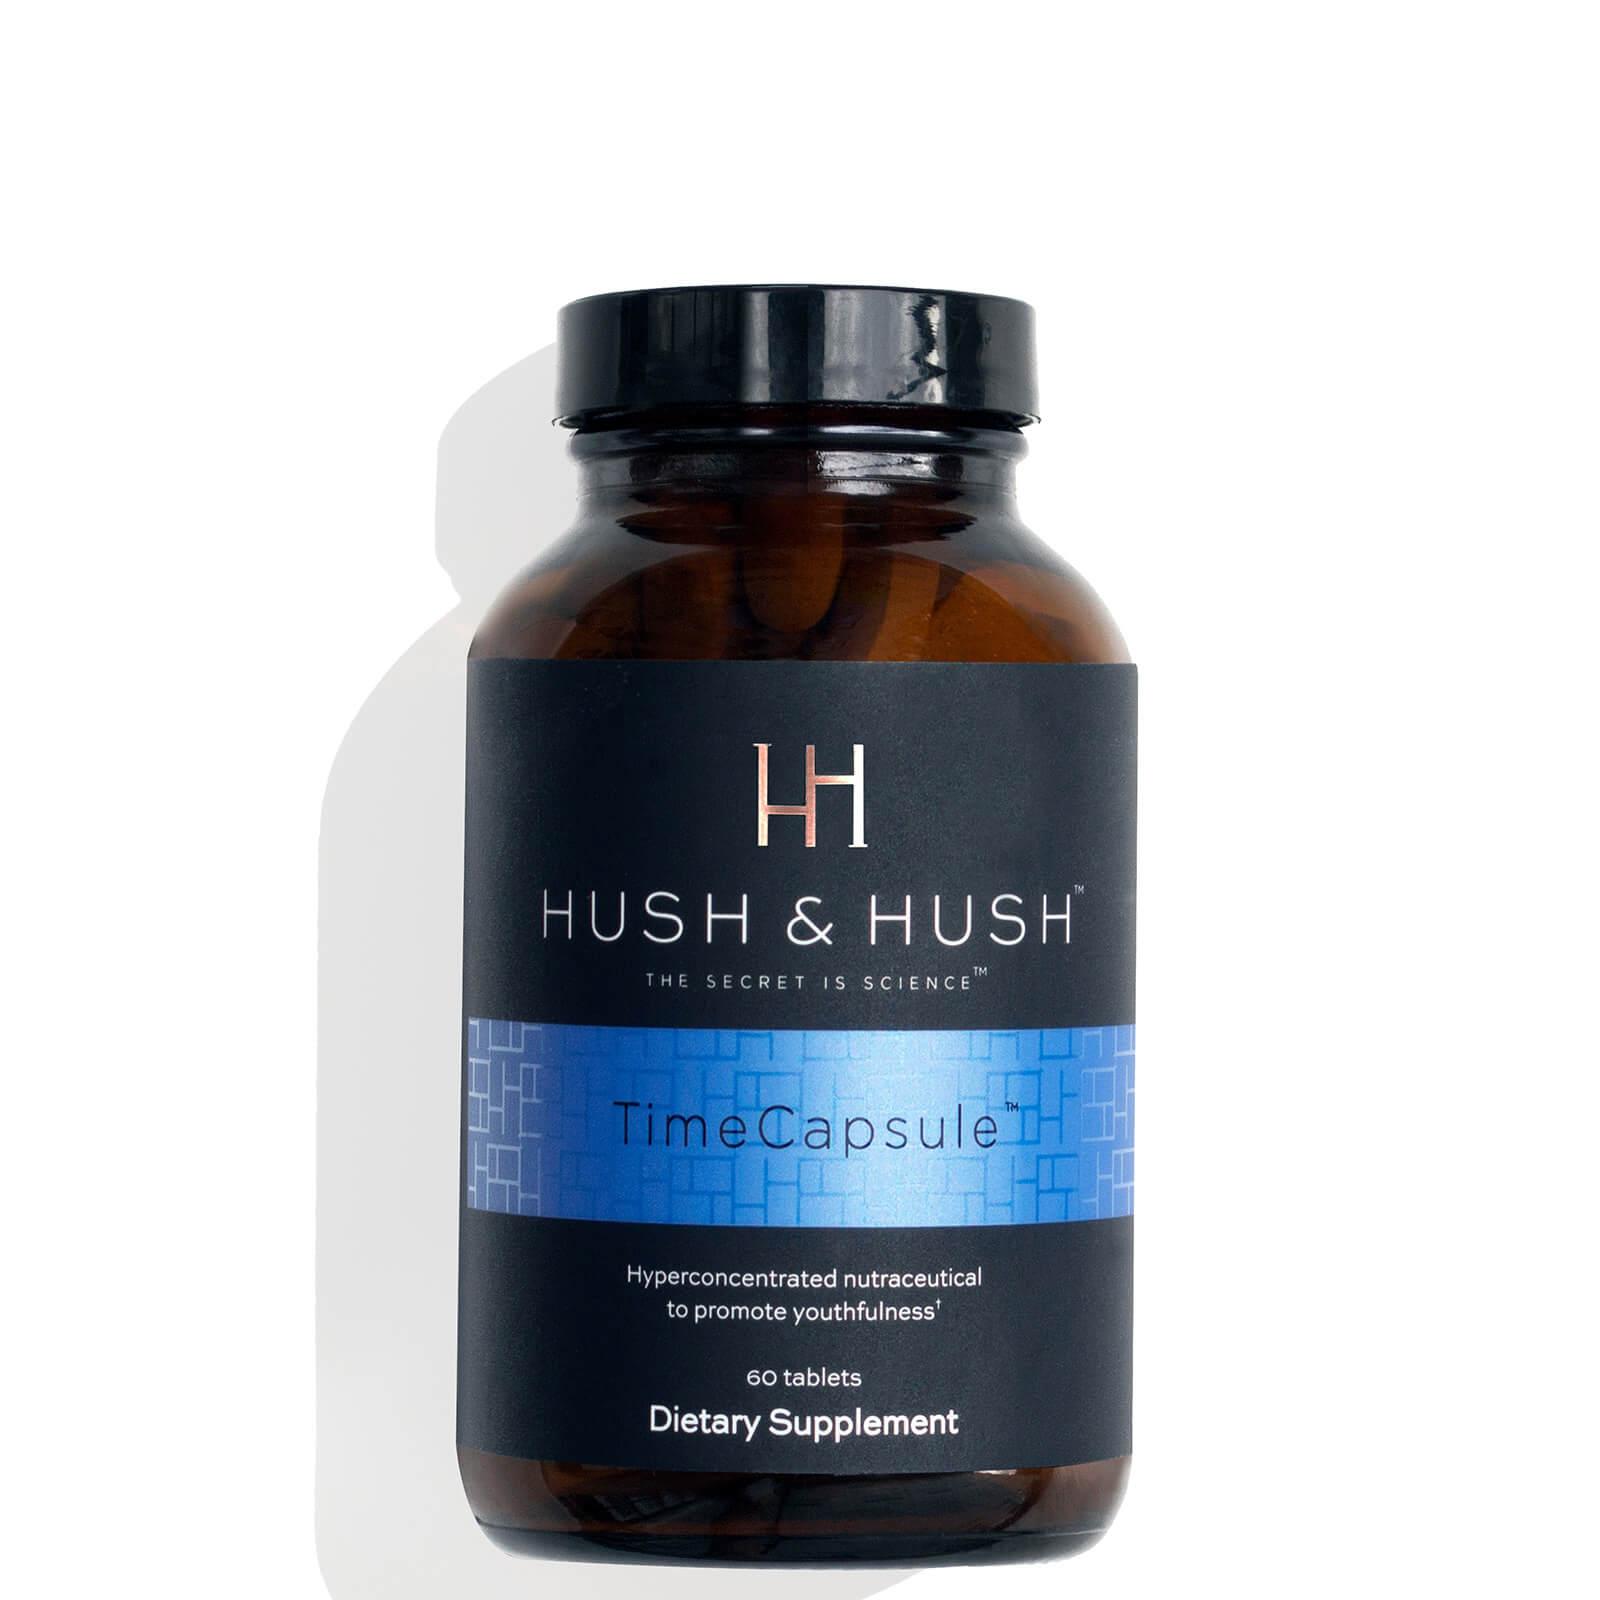 Hush & Hush Hush Hush Timecapsule 60 Capsules In Brown